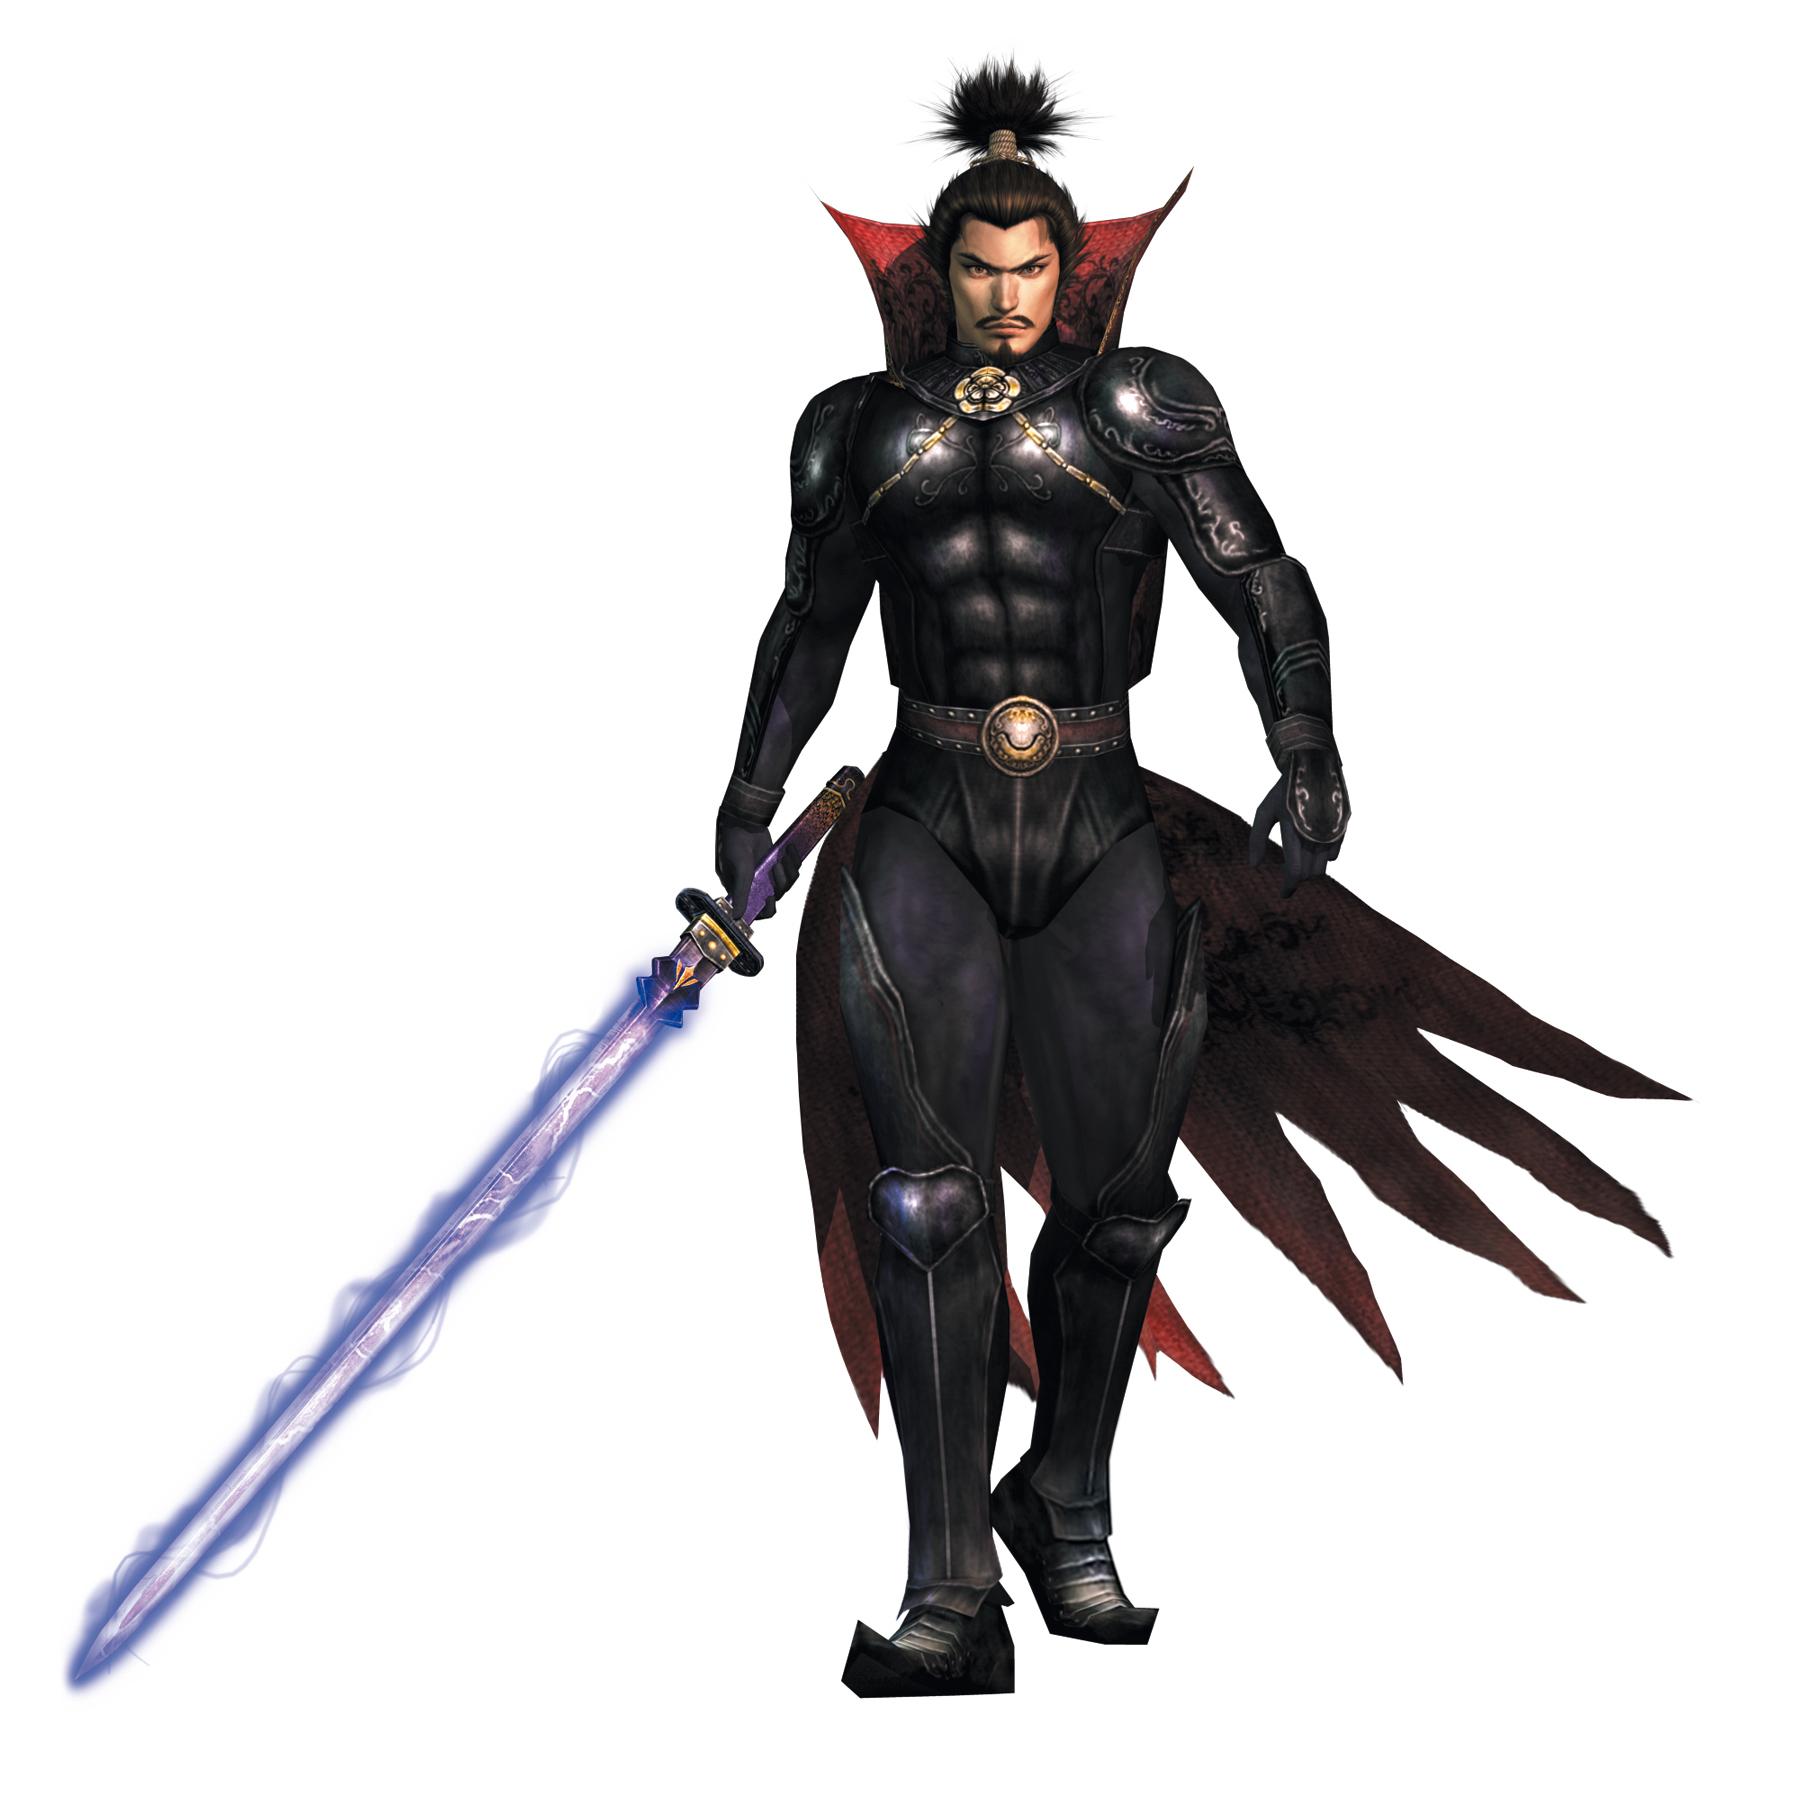 Warriors Orochi 4 Characters List: Image - Nobunaga Oda.jpg